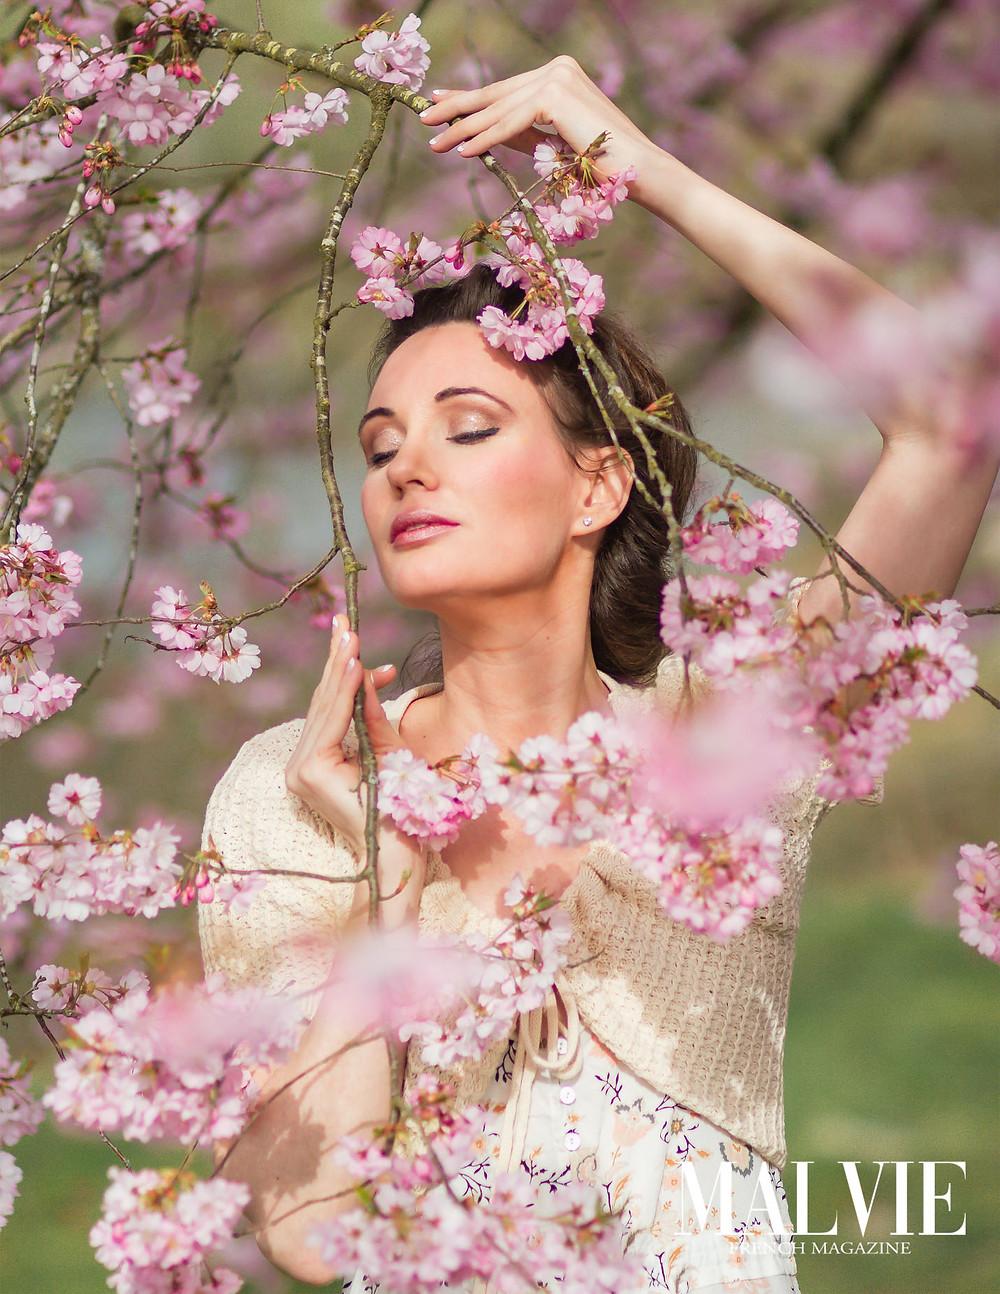 Model: Amber Smith Photographer: Clicks By Hira